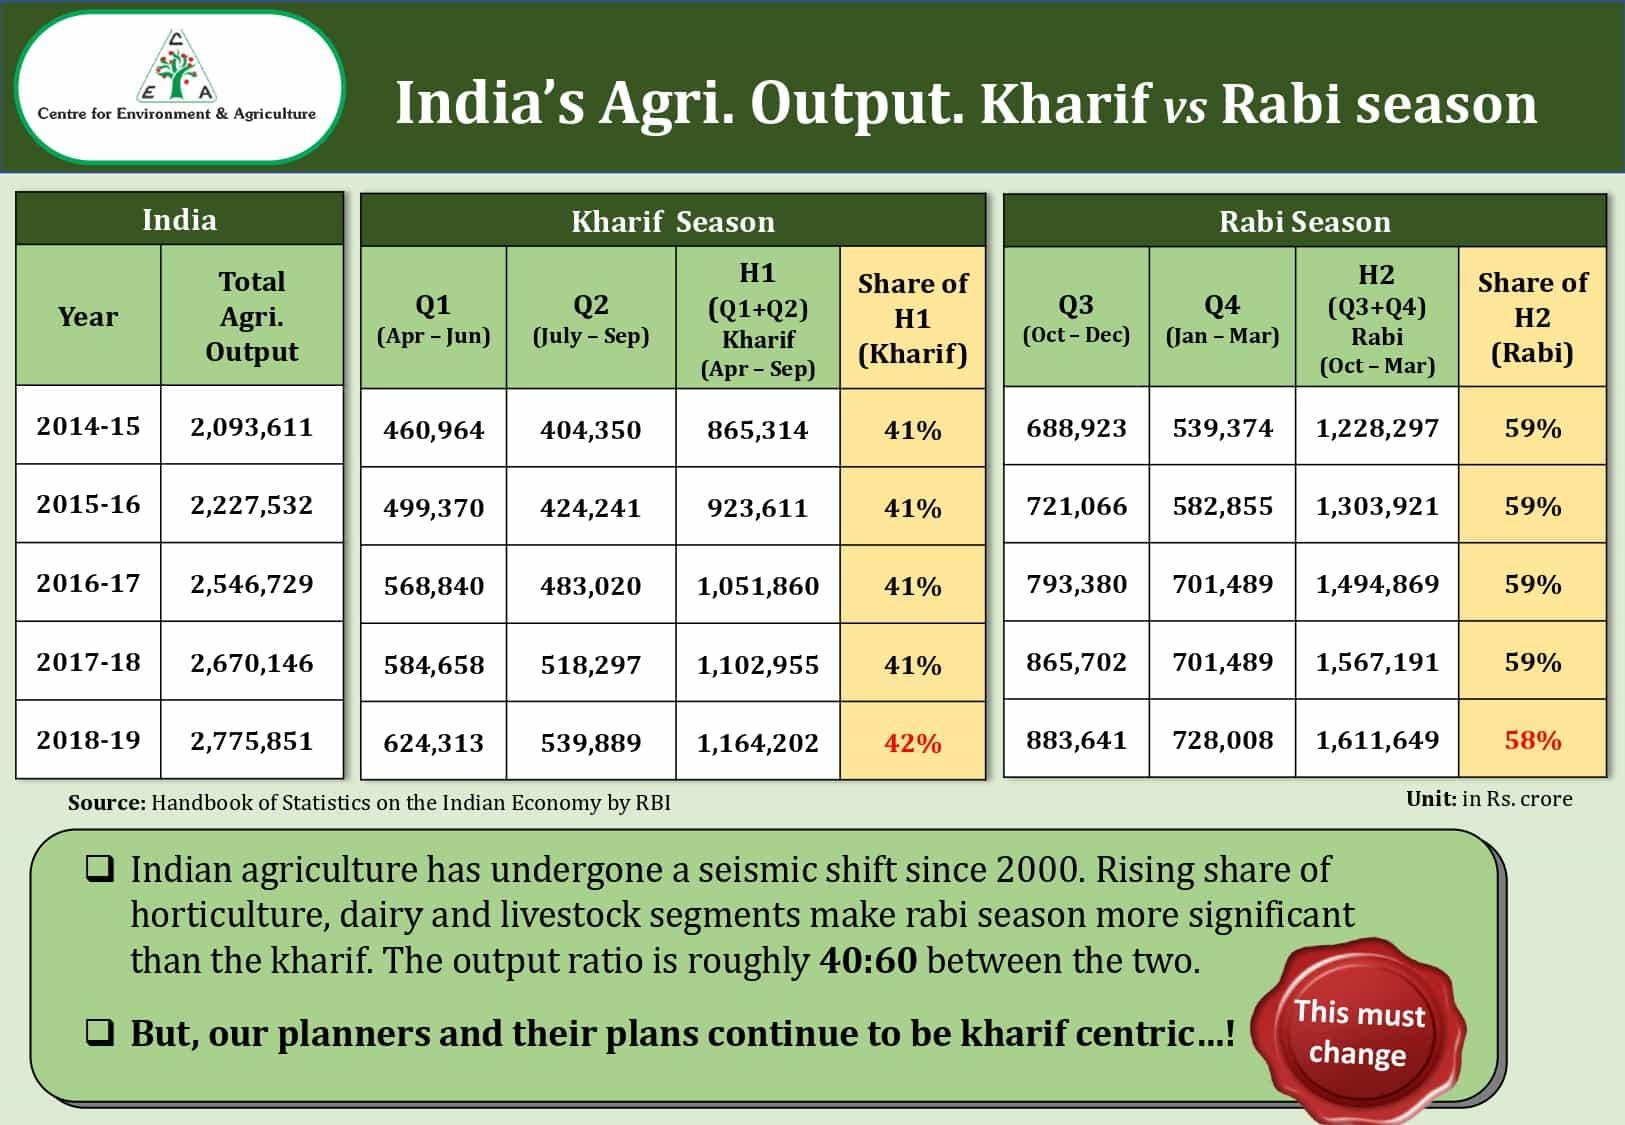 India's Agri. output - Kharif vs Rabi